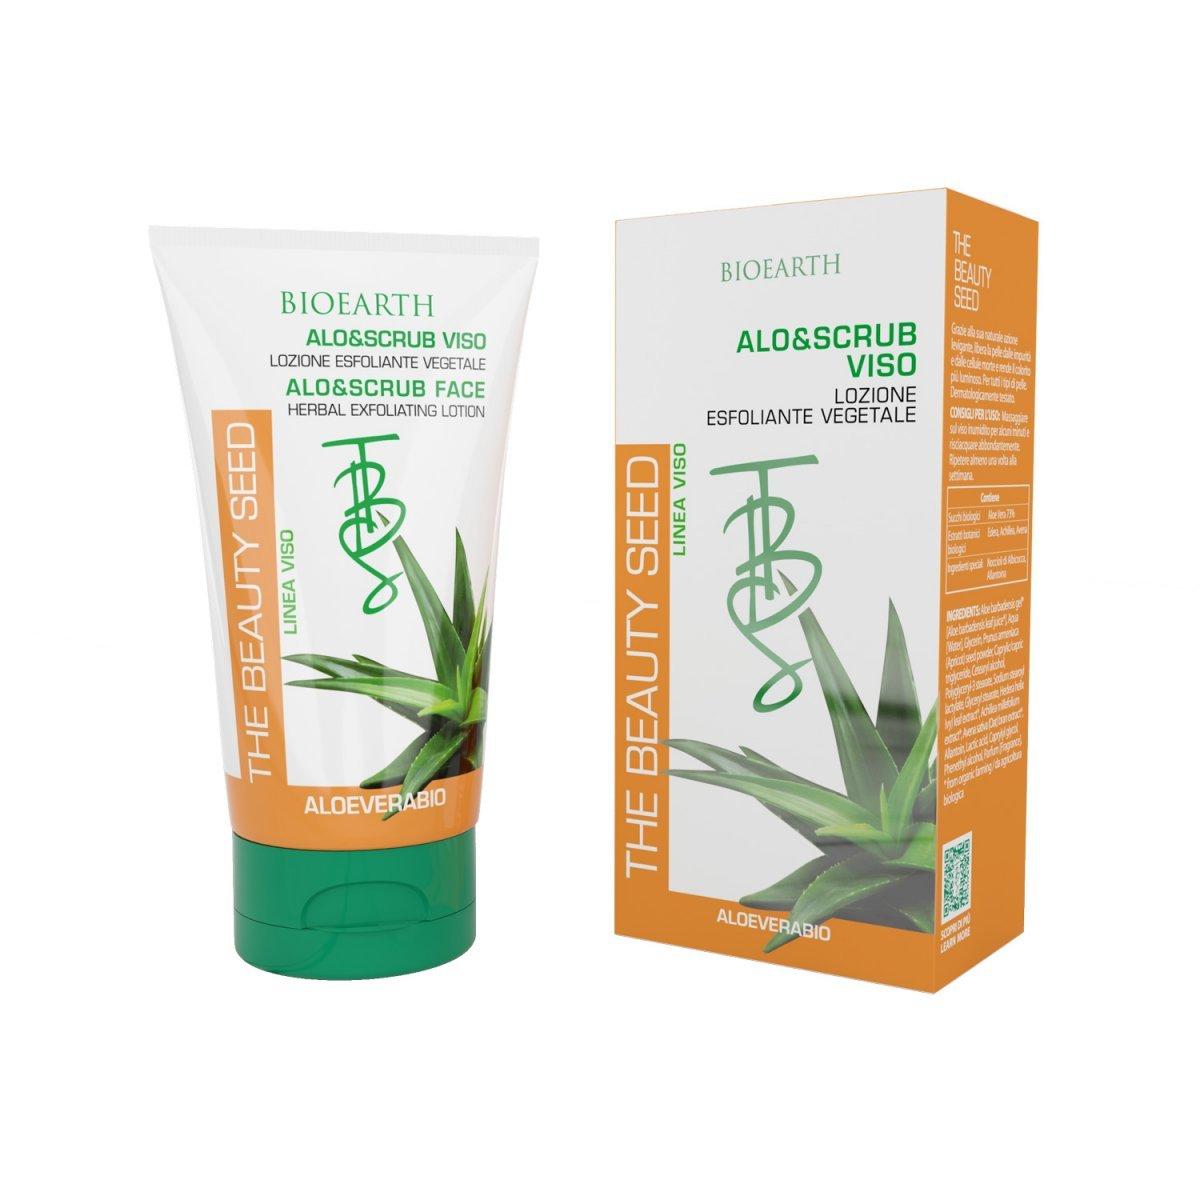 The Beauty Seed Aloe scrub exfoliating lotion